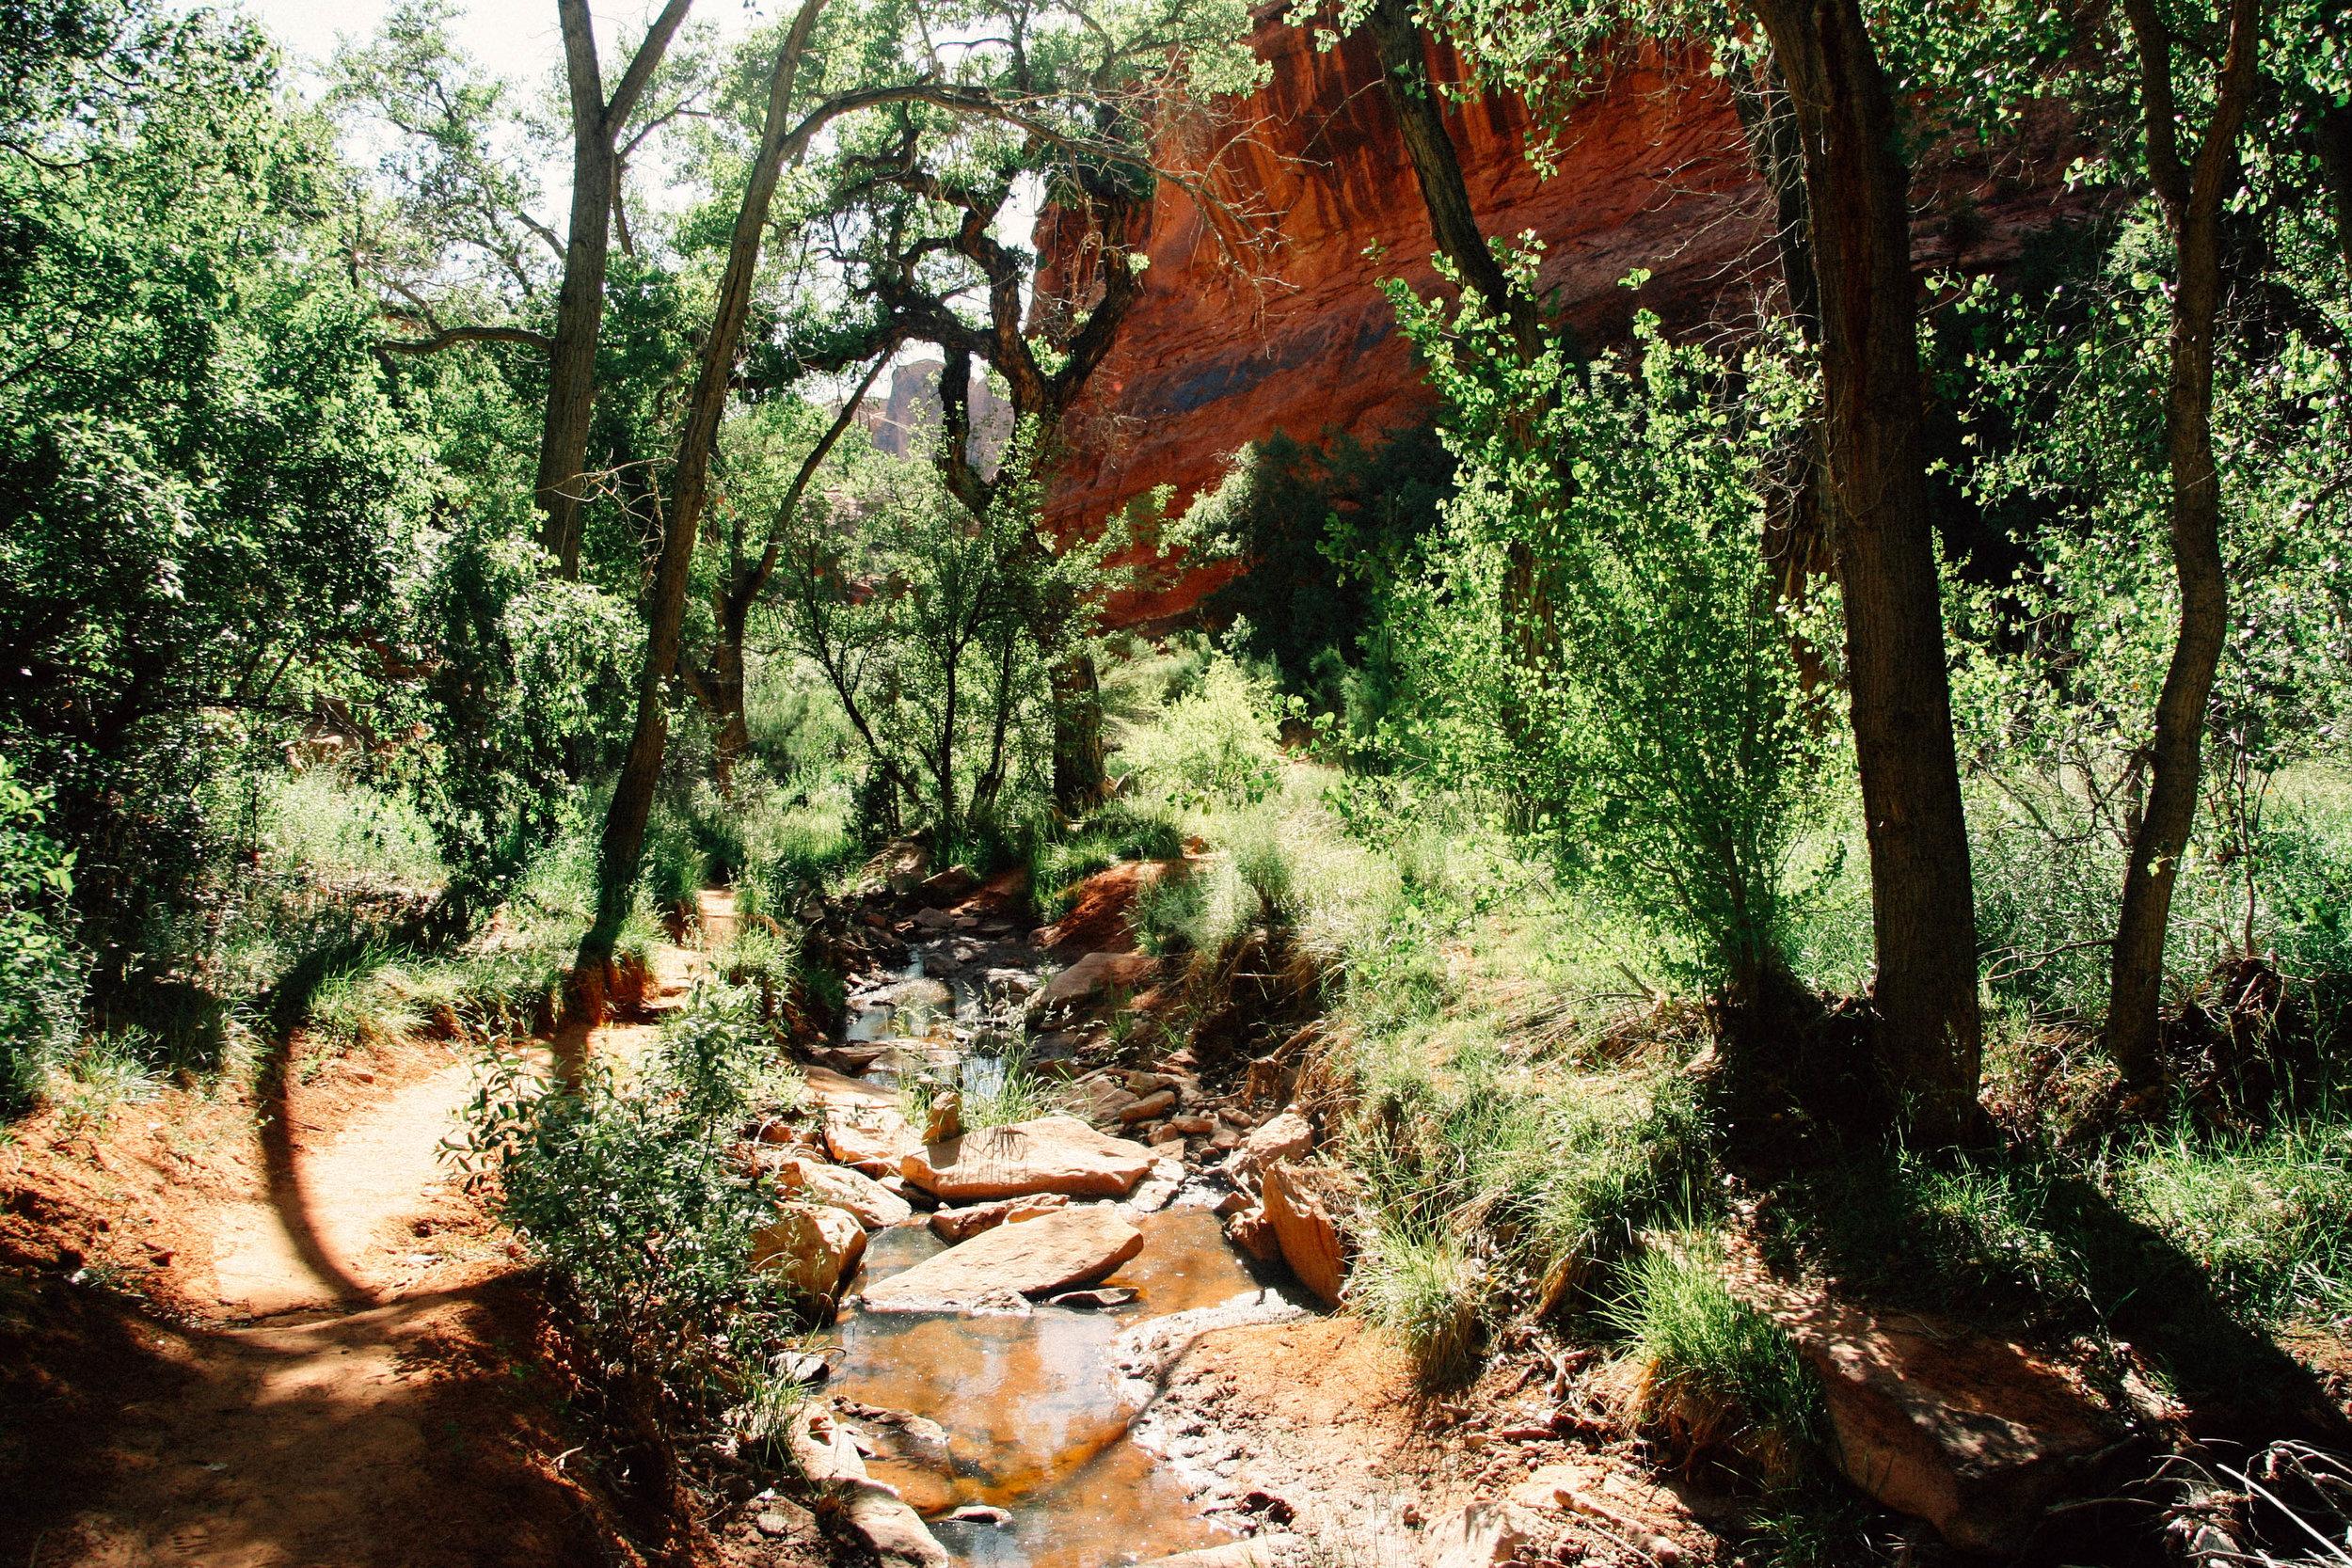 Cottonwood grove in the deep canyon riparian zones, near Moab, Utah.